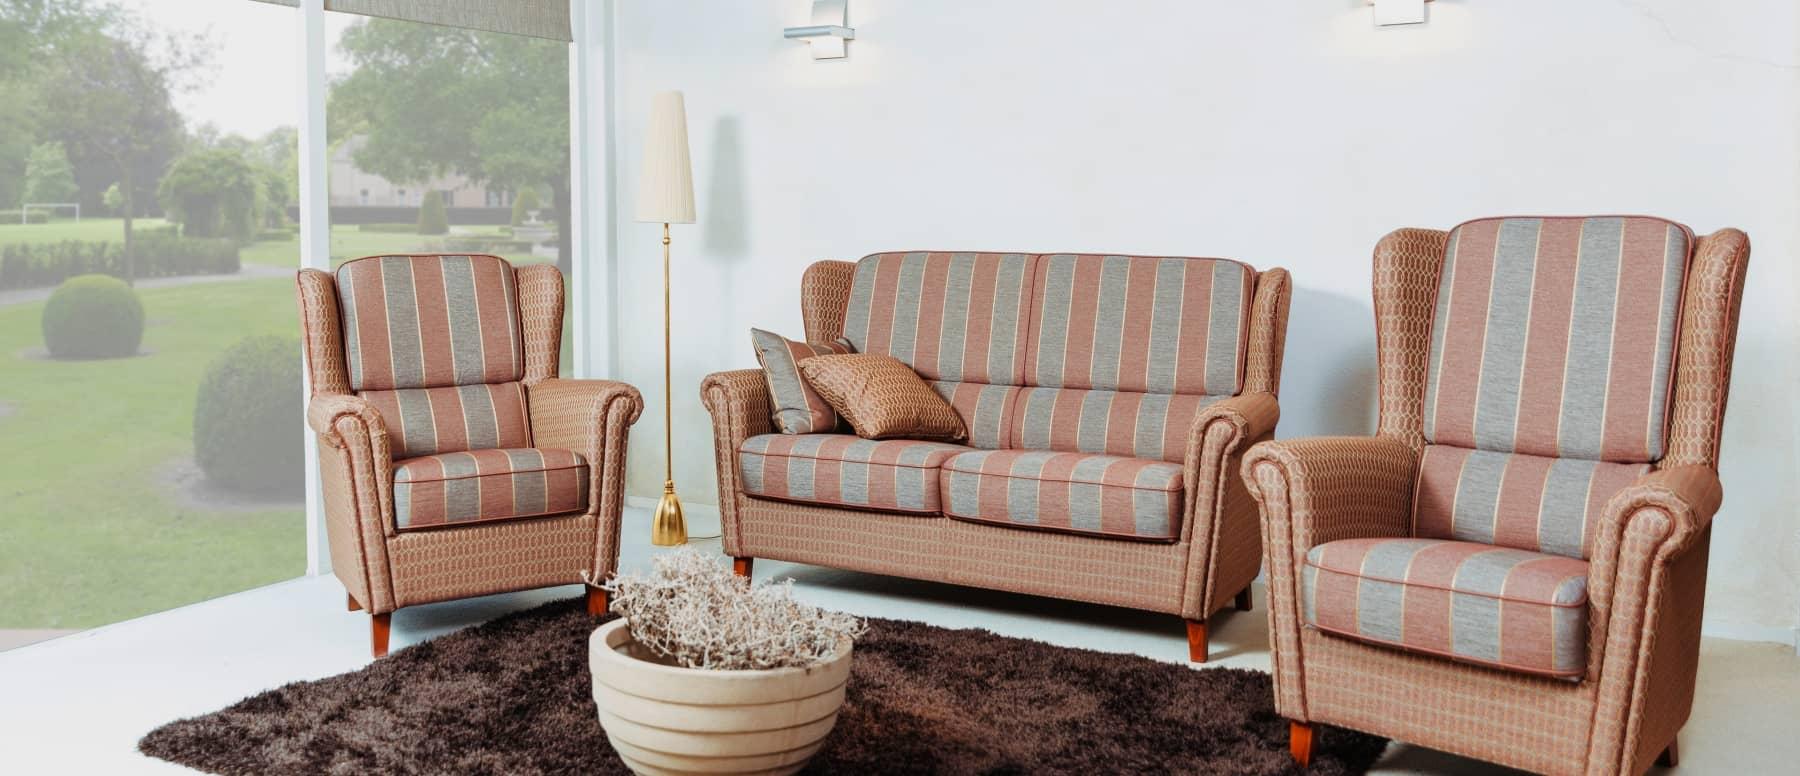 DN design meubelen 3